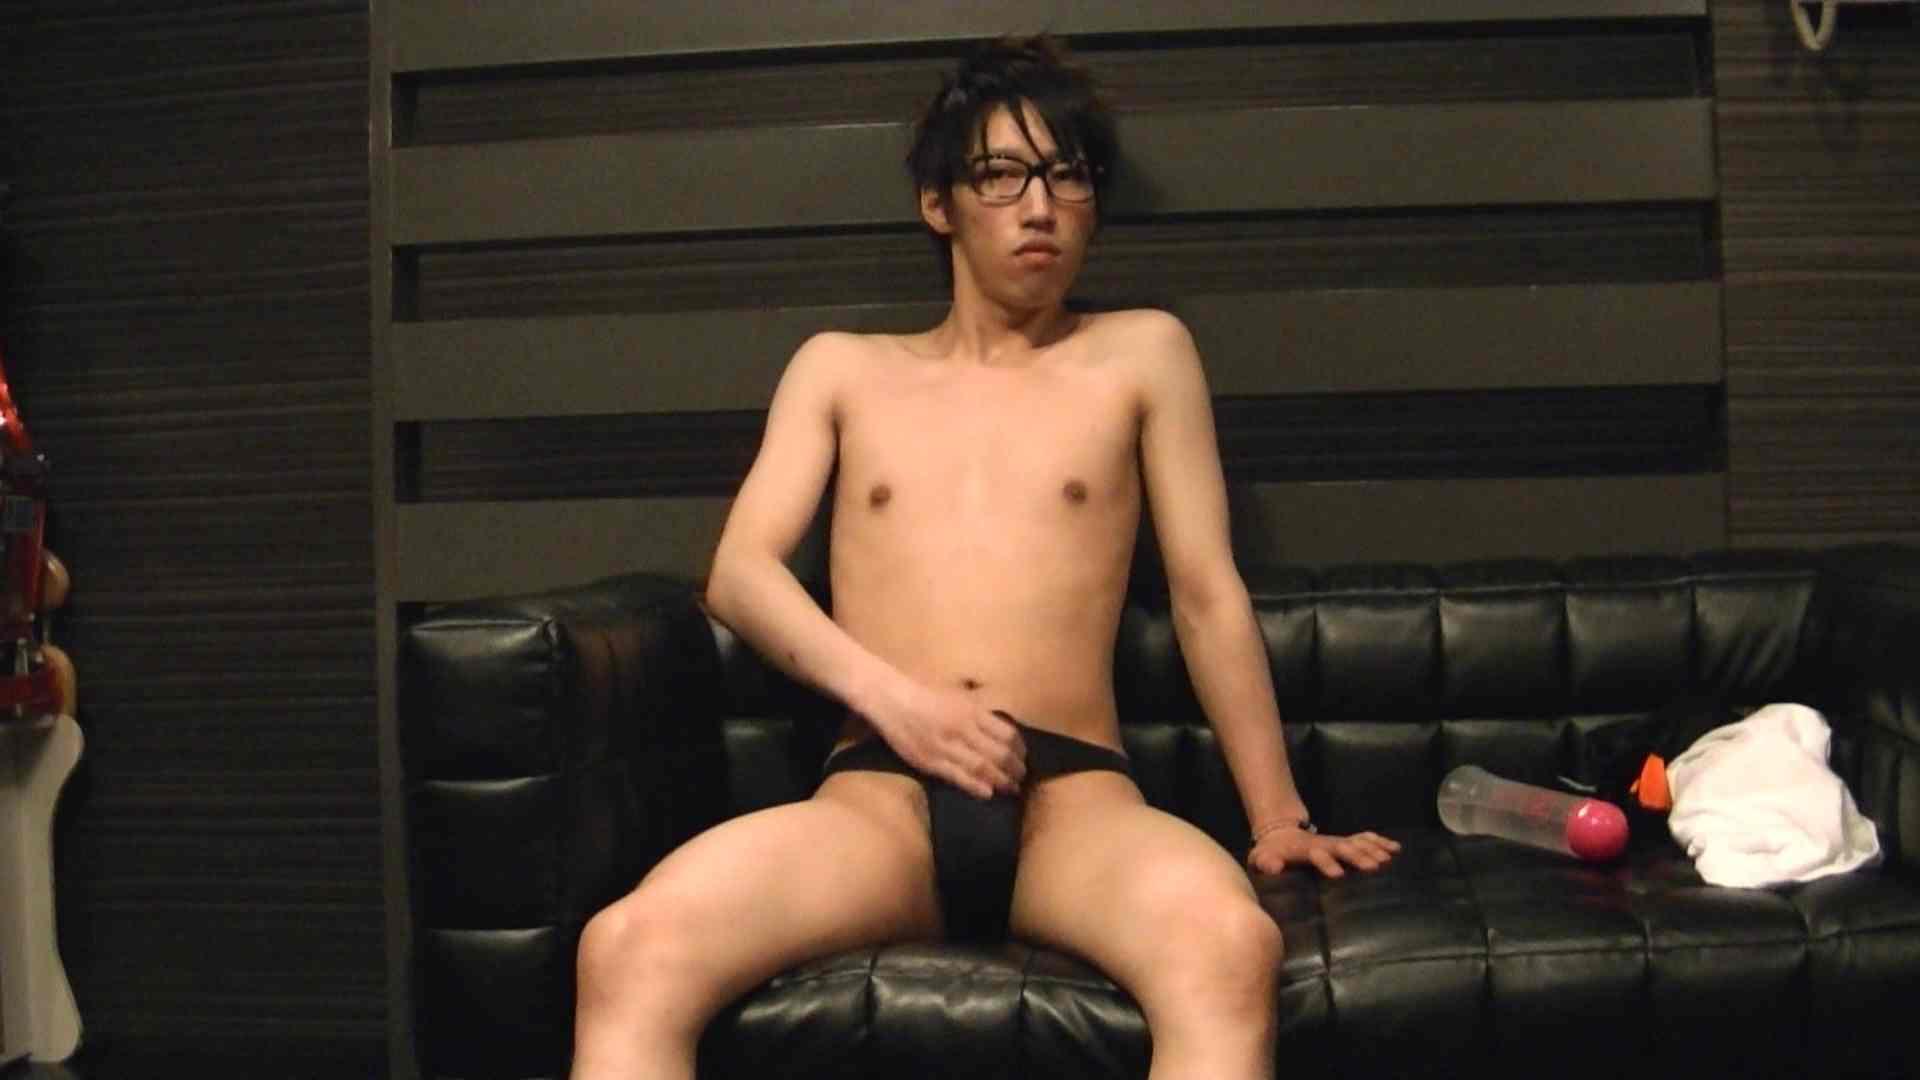 Mr.オナックスさん投稿!HD 貴方のオナニー三万円で撮影させてください。VOL.04 スリム美少年系ジャニ系 ゲイエロビデオ画像 55連発 20